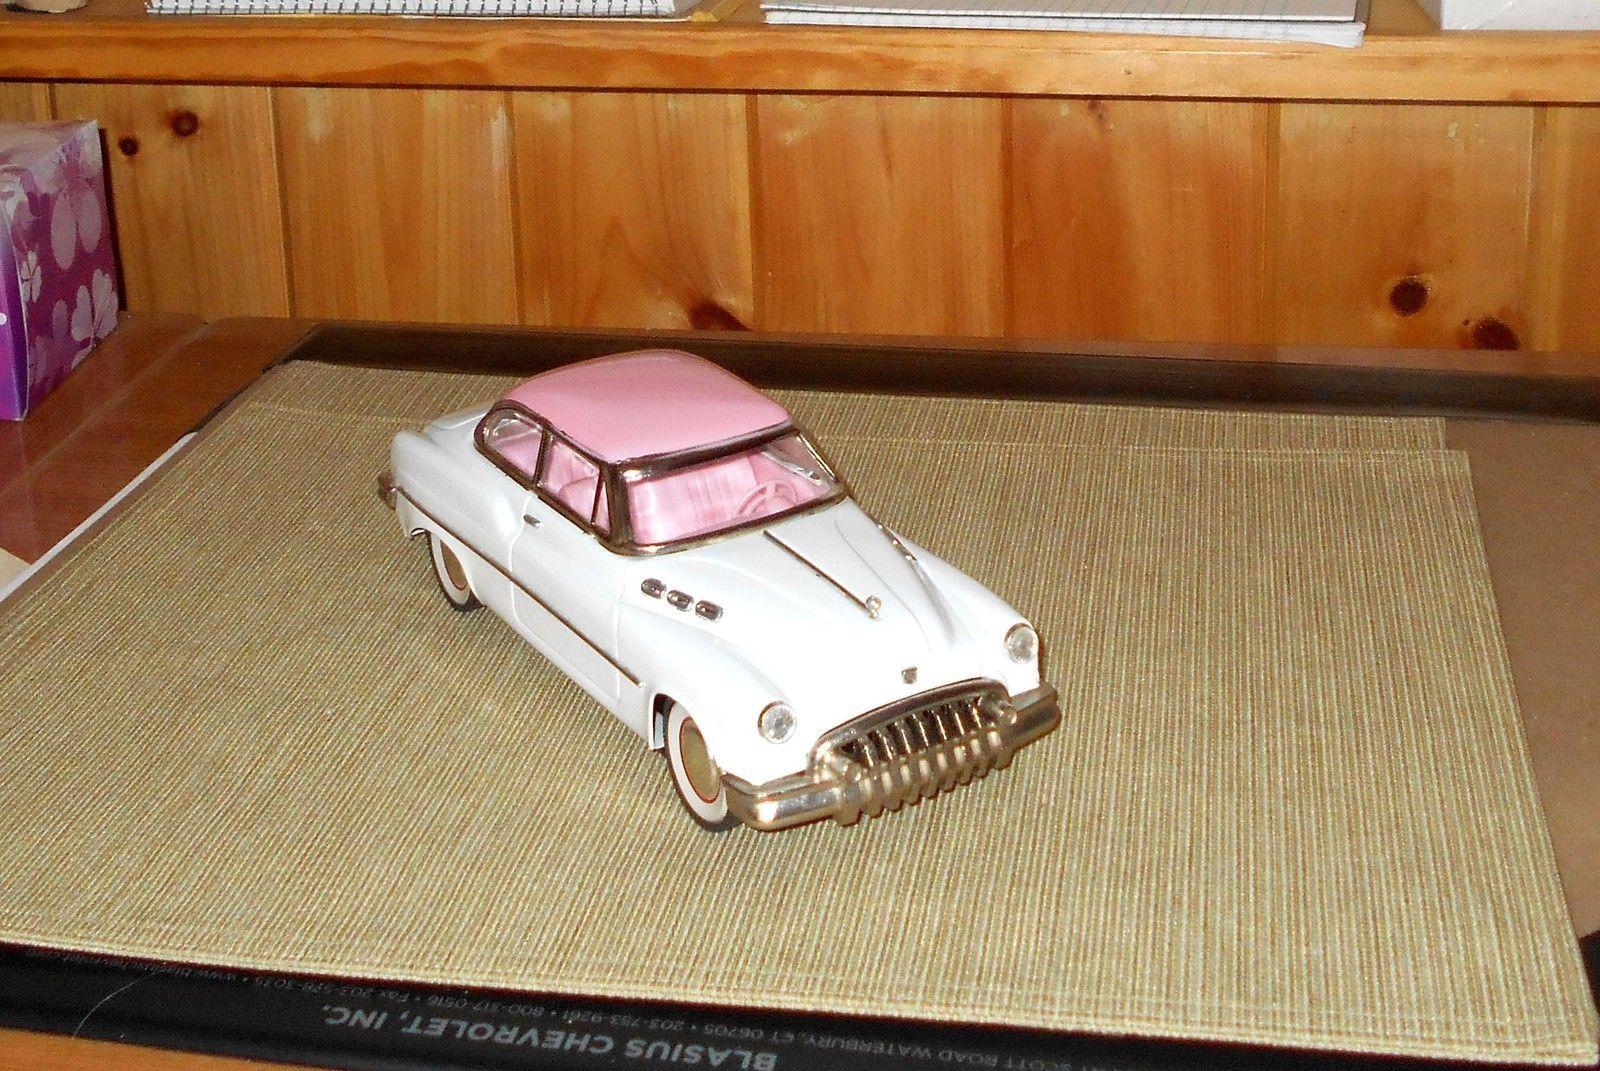 "1950 Buick Roadmaster 2-Door Hardtop Friction Car 11"" White & Pink"